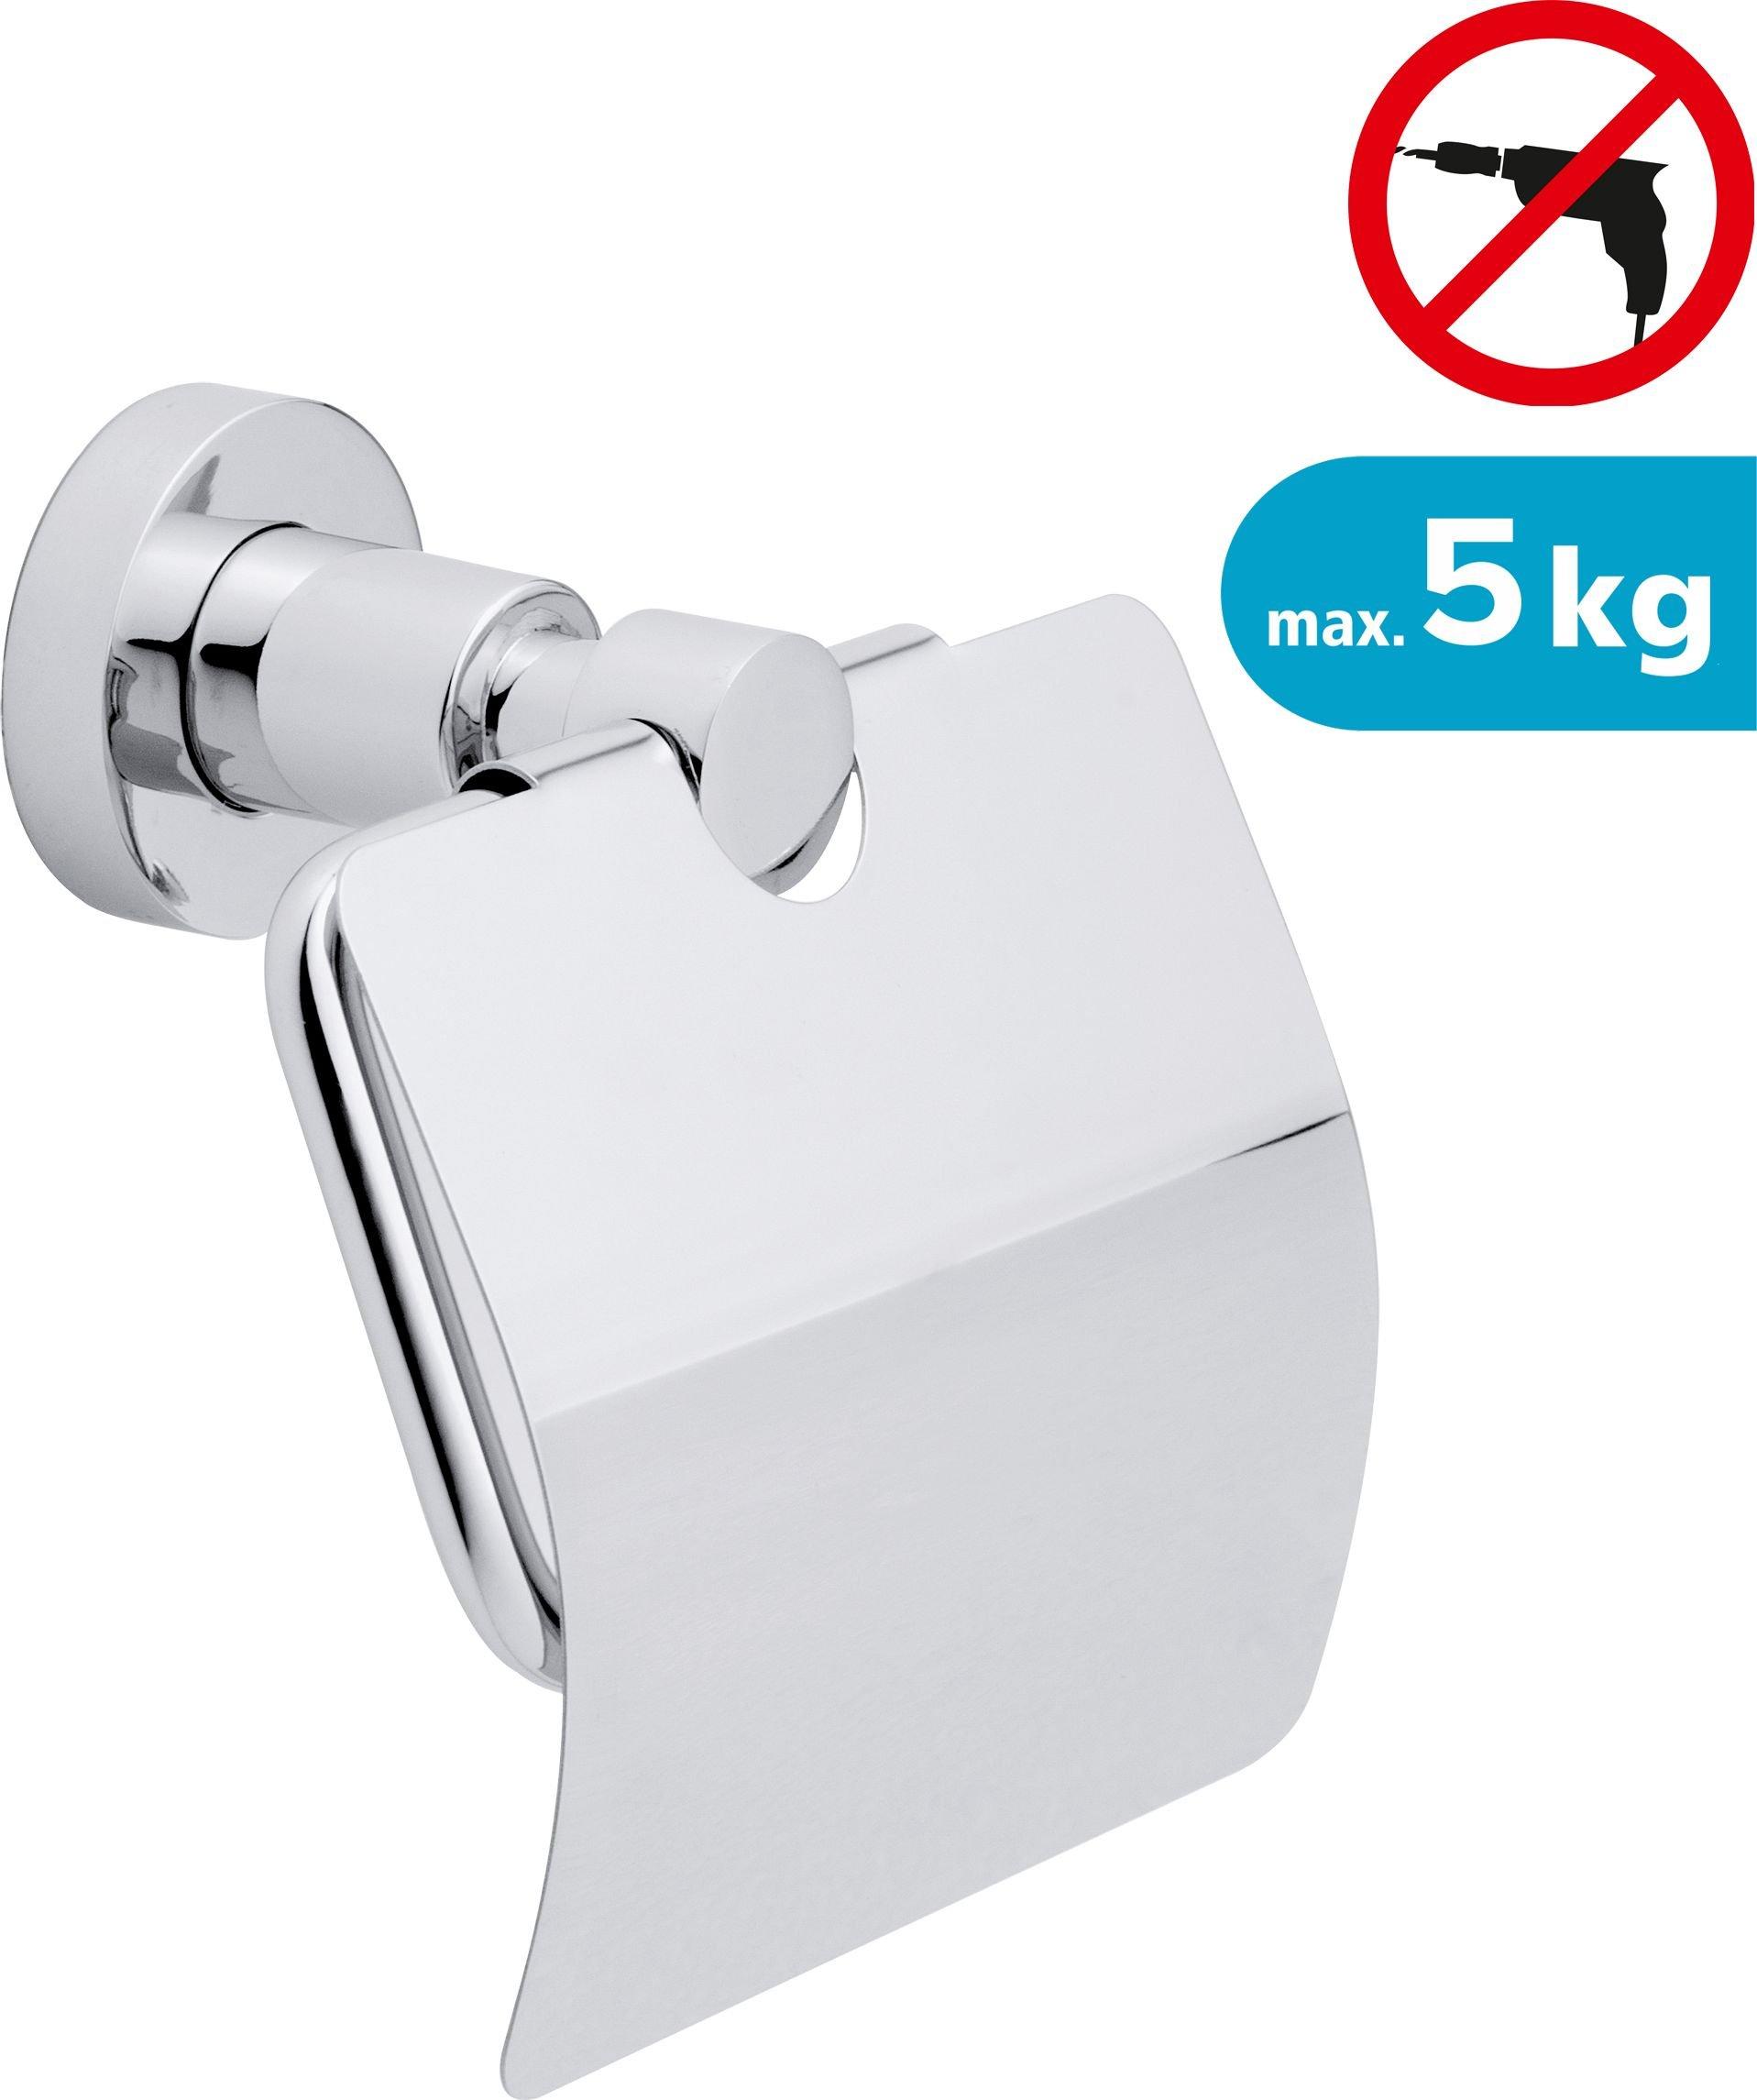 Tesa Toilet paper holder suction cup chrome (40273-00000-00) Vannas istabas piederumi